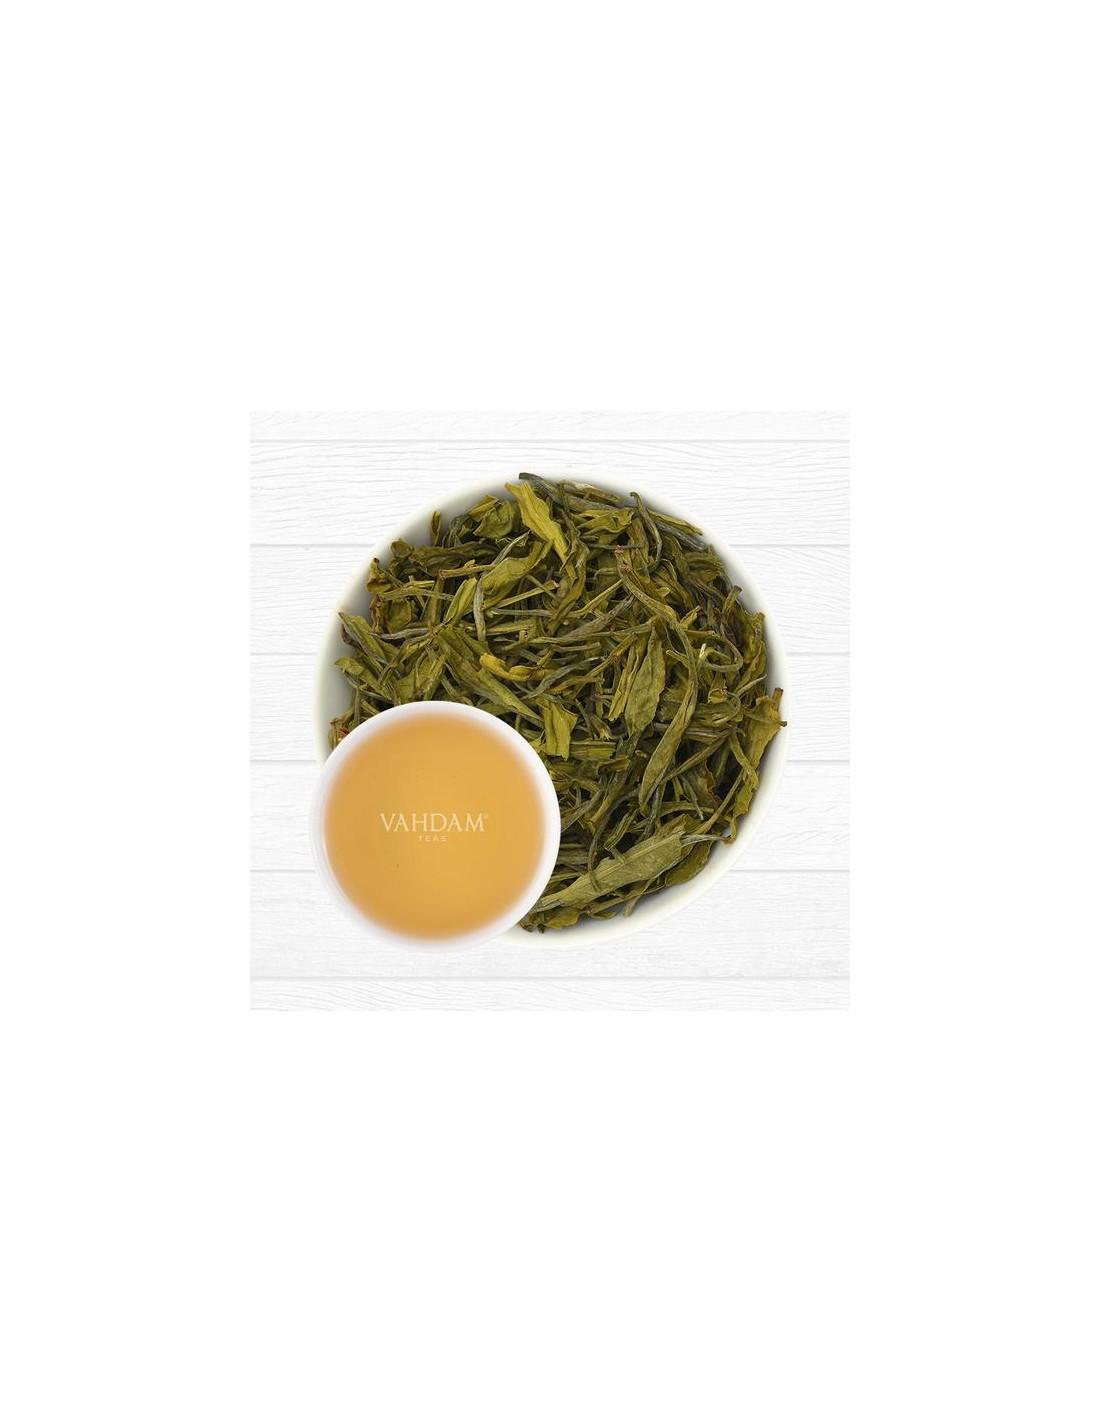 Blue Mountain Nilgiri Green Tea - Glendale - Republika Smaków Sp. z o.o.